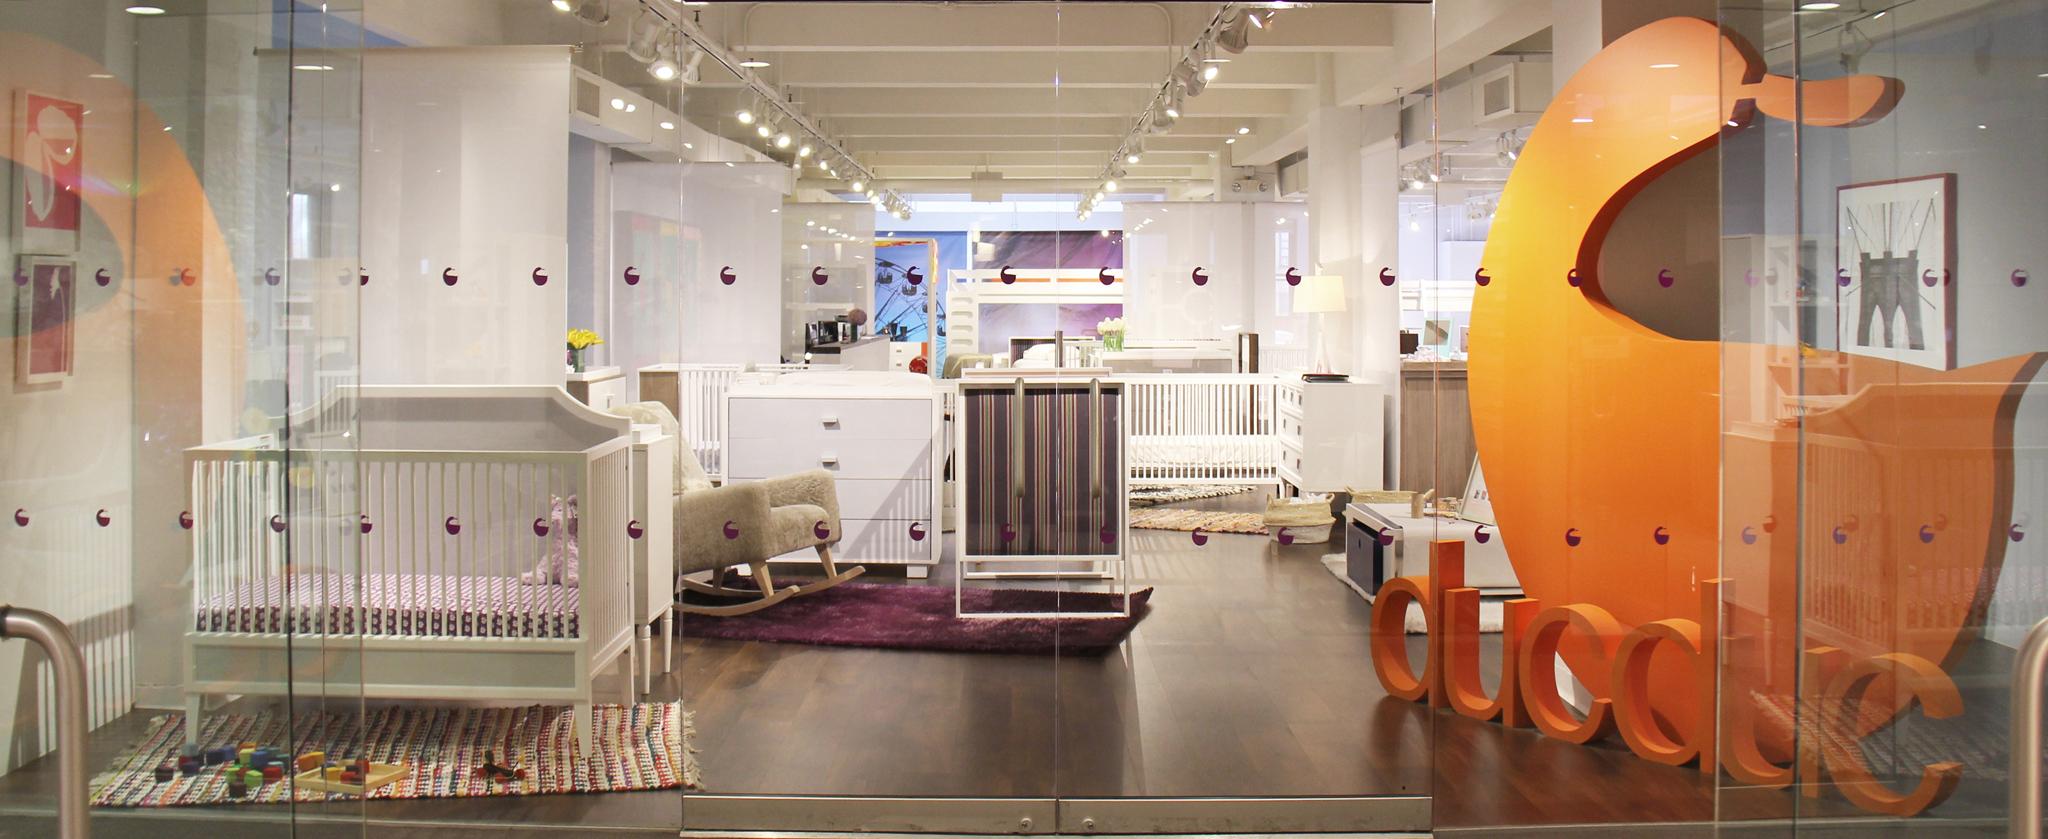 ducduc Showroom in NYC